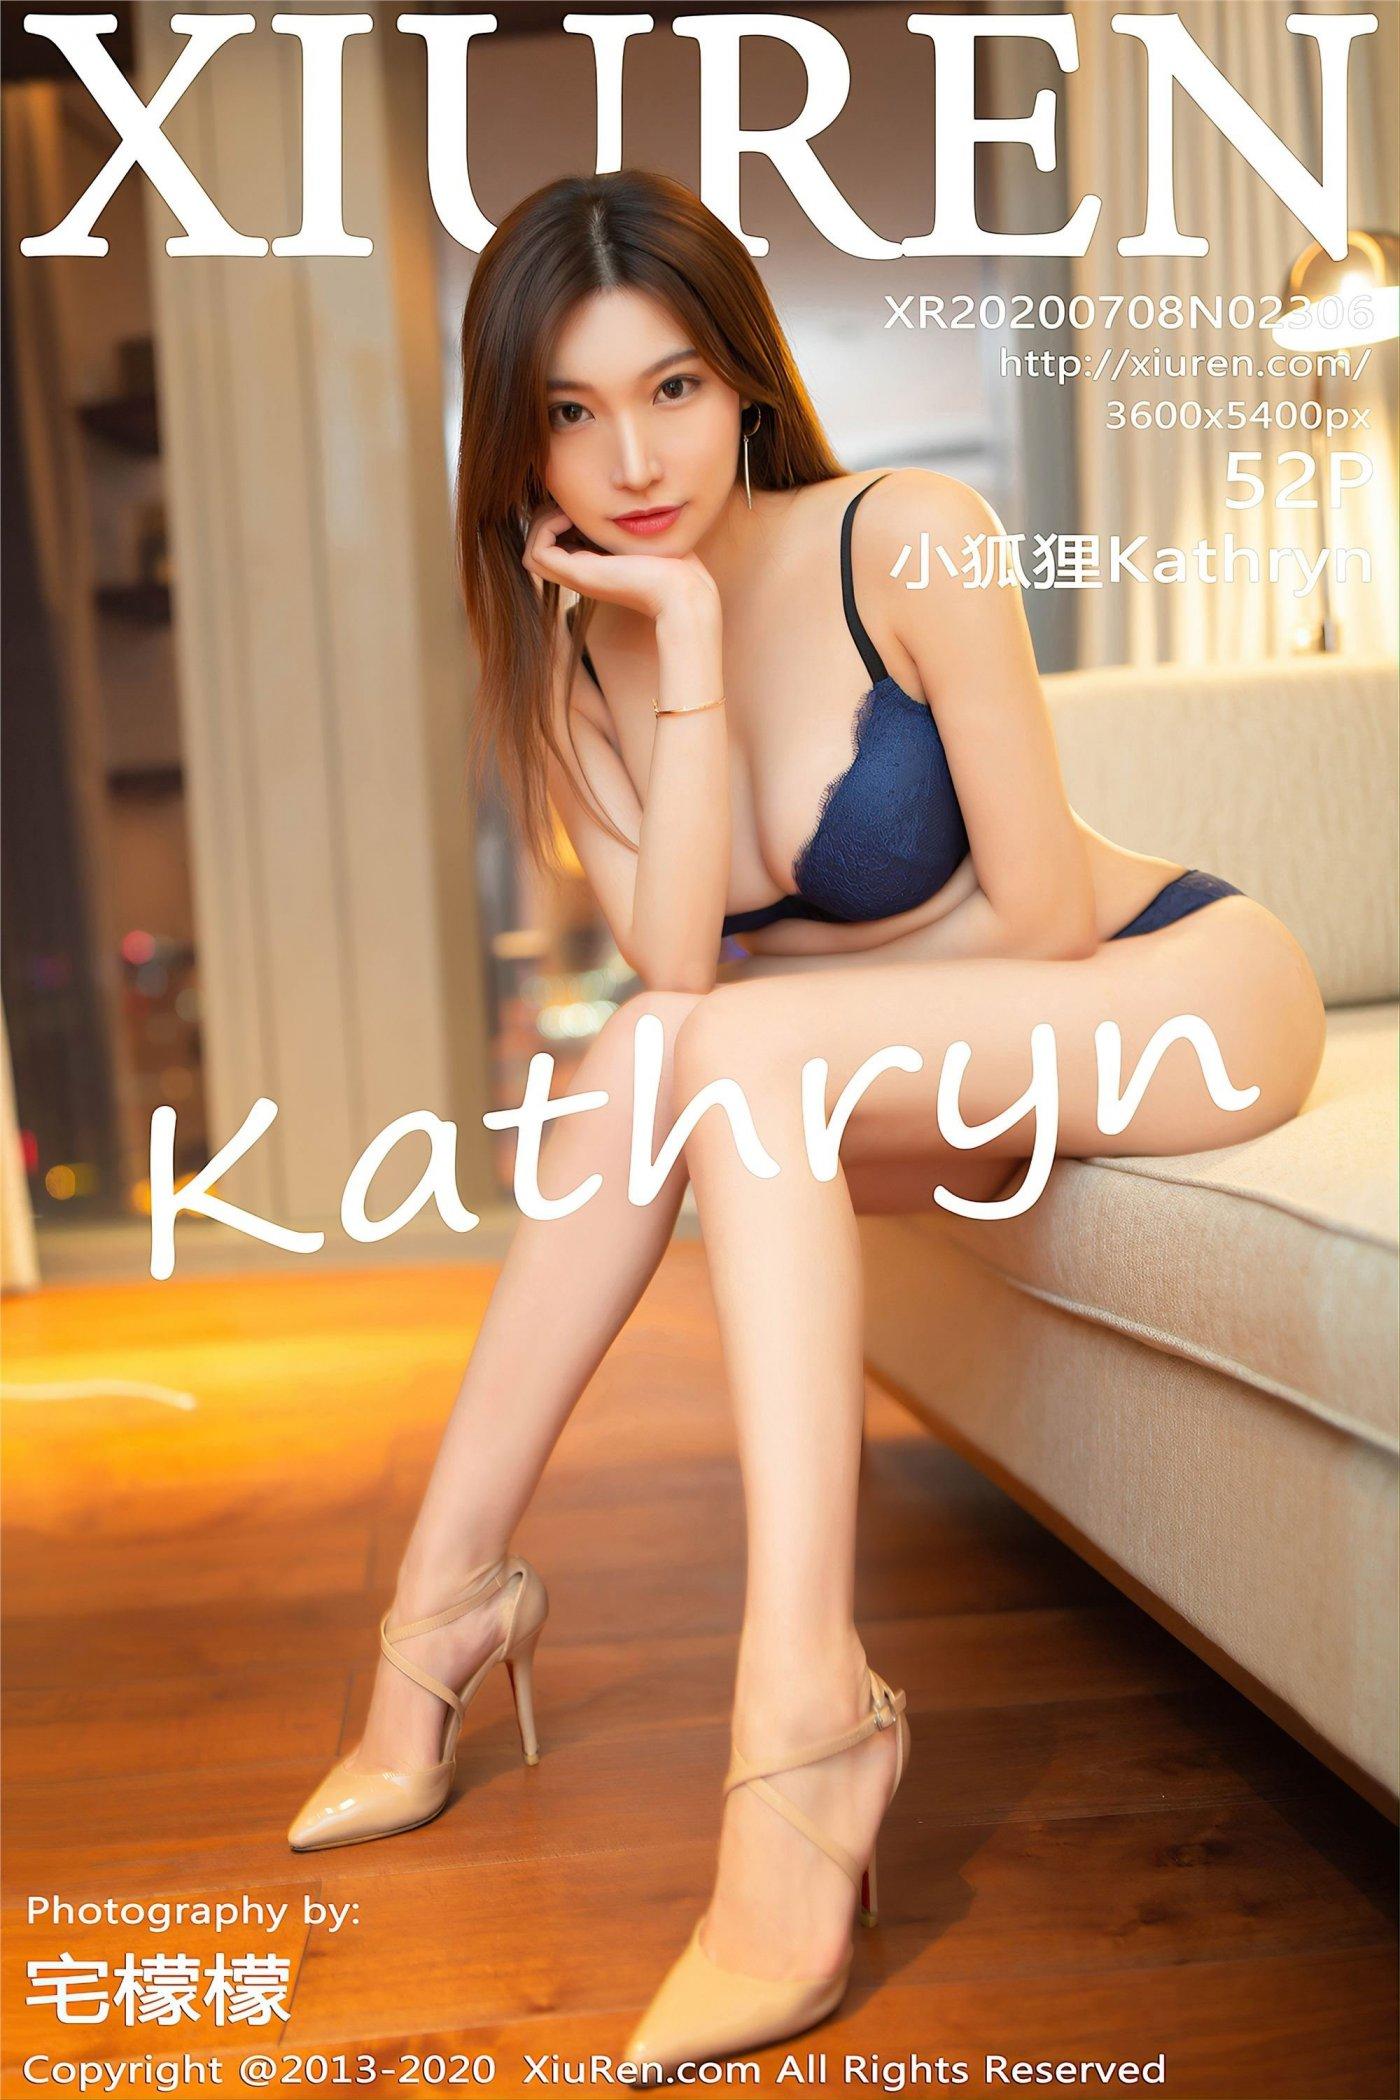 小狐狸kathryn(Vol. 2306) 性感mm-第1张